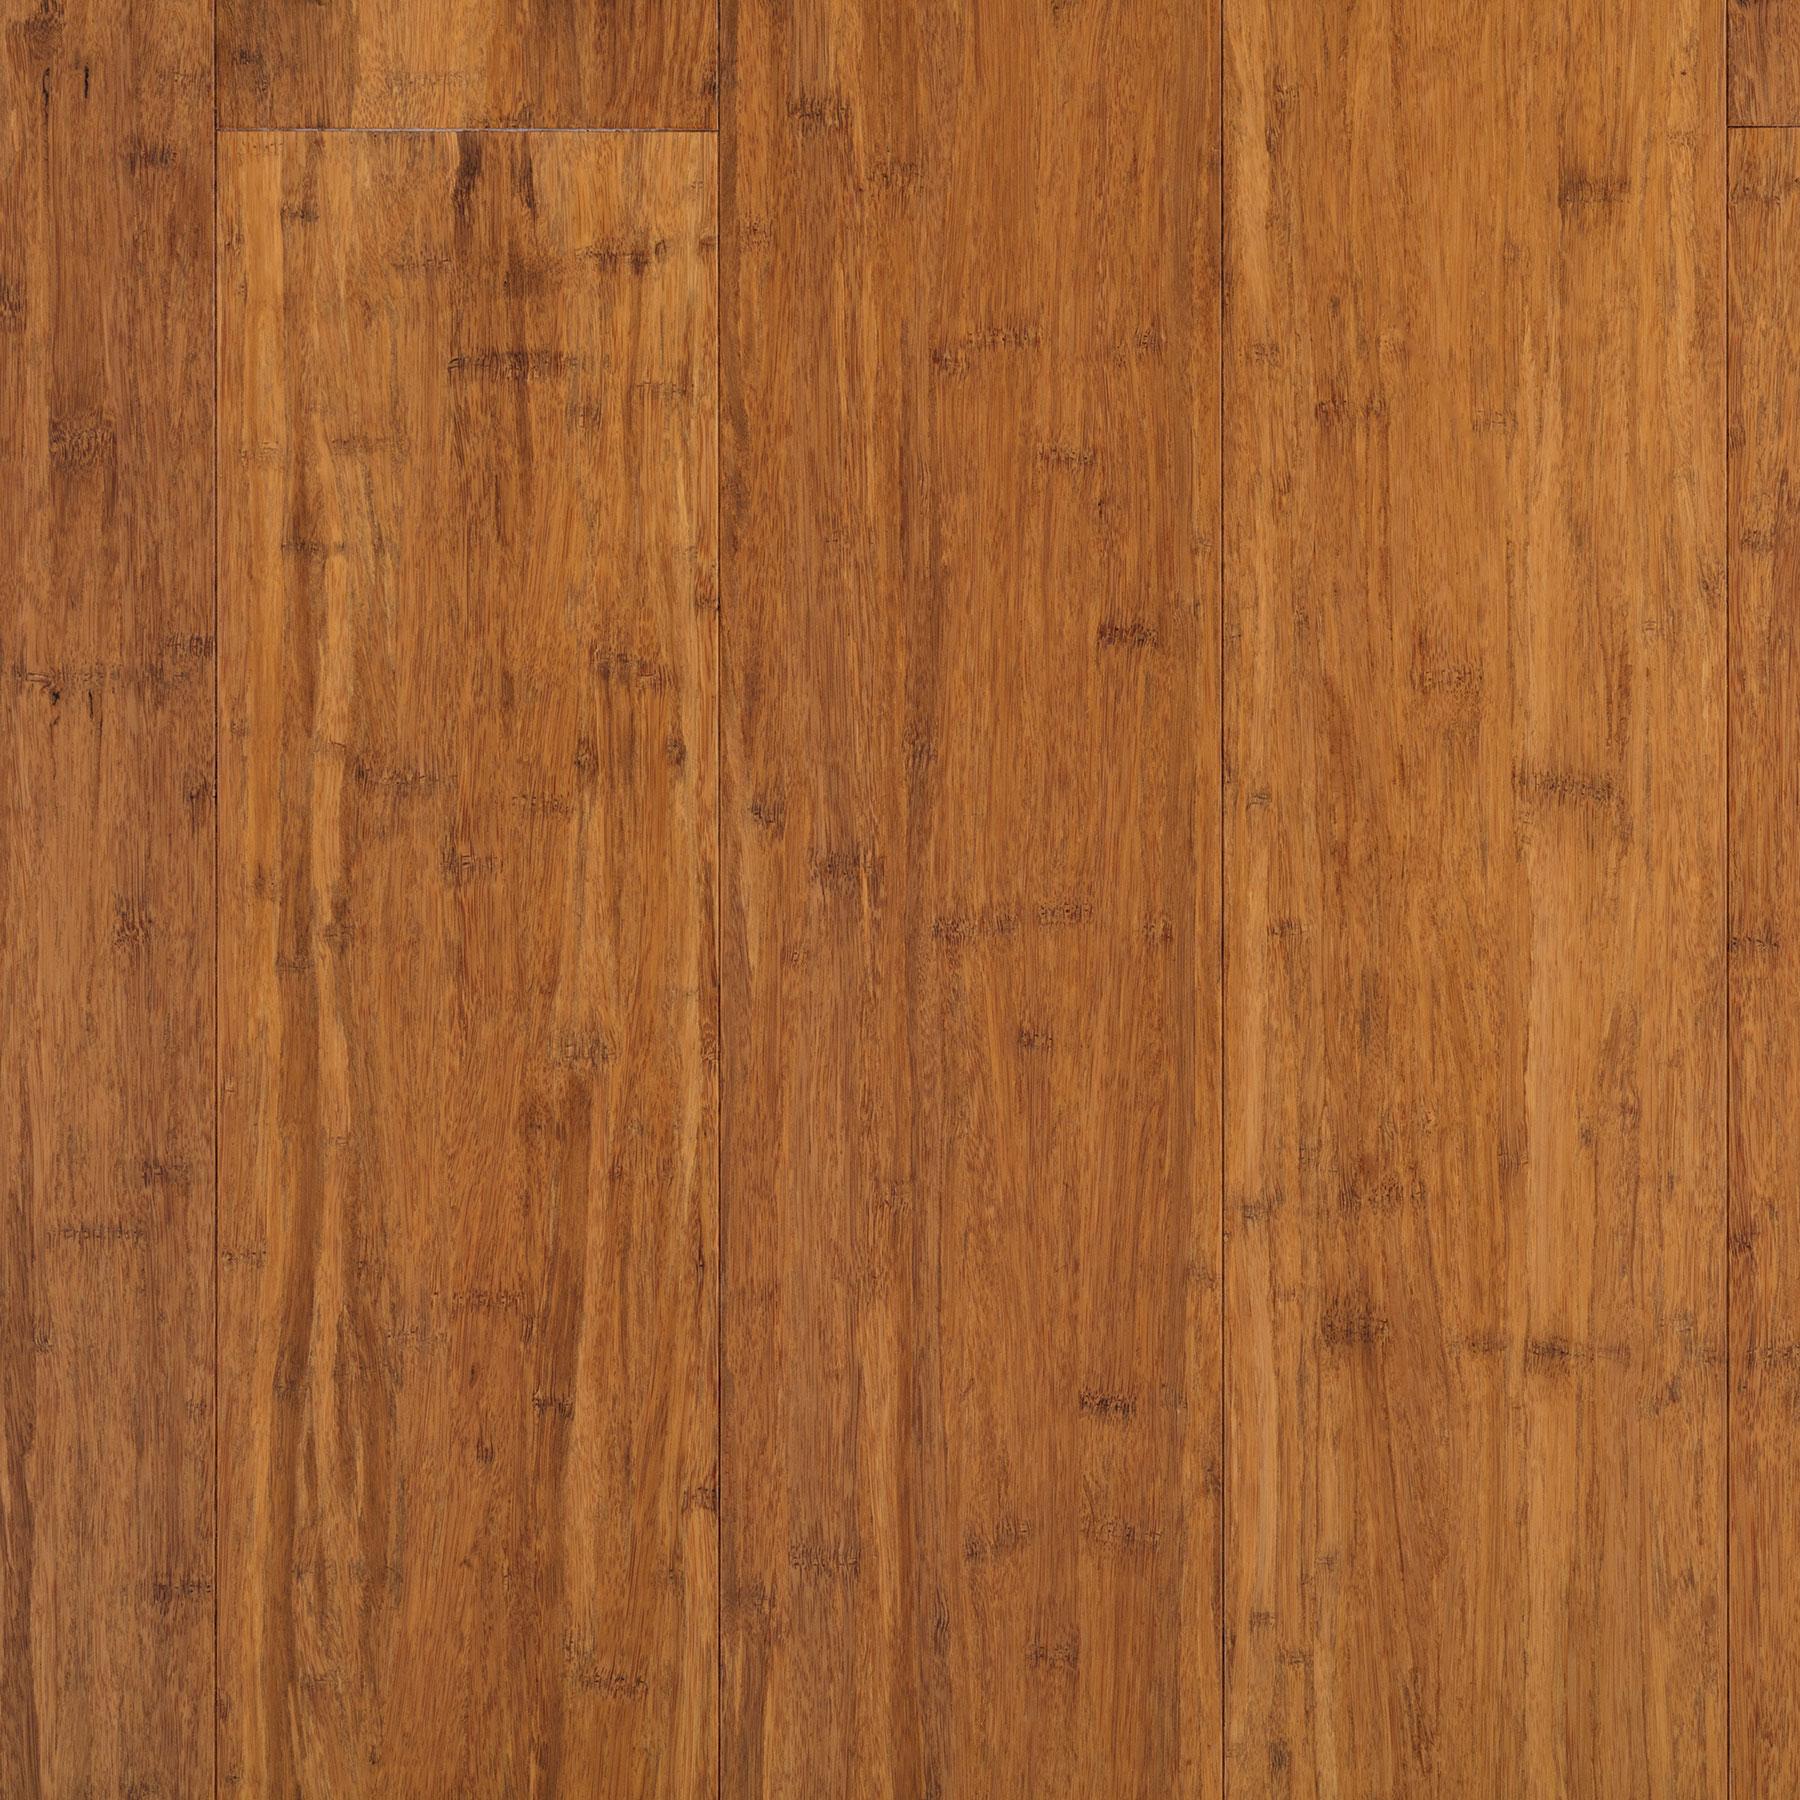 Tesoro Woods Moso 174 Bamboo Flooring Super Strand Bamboo